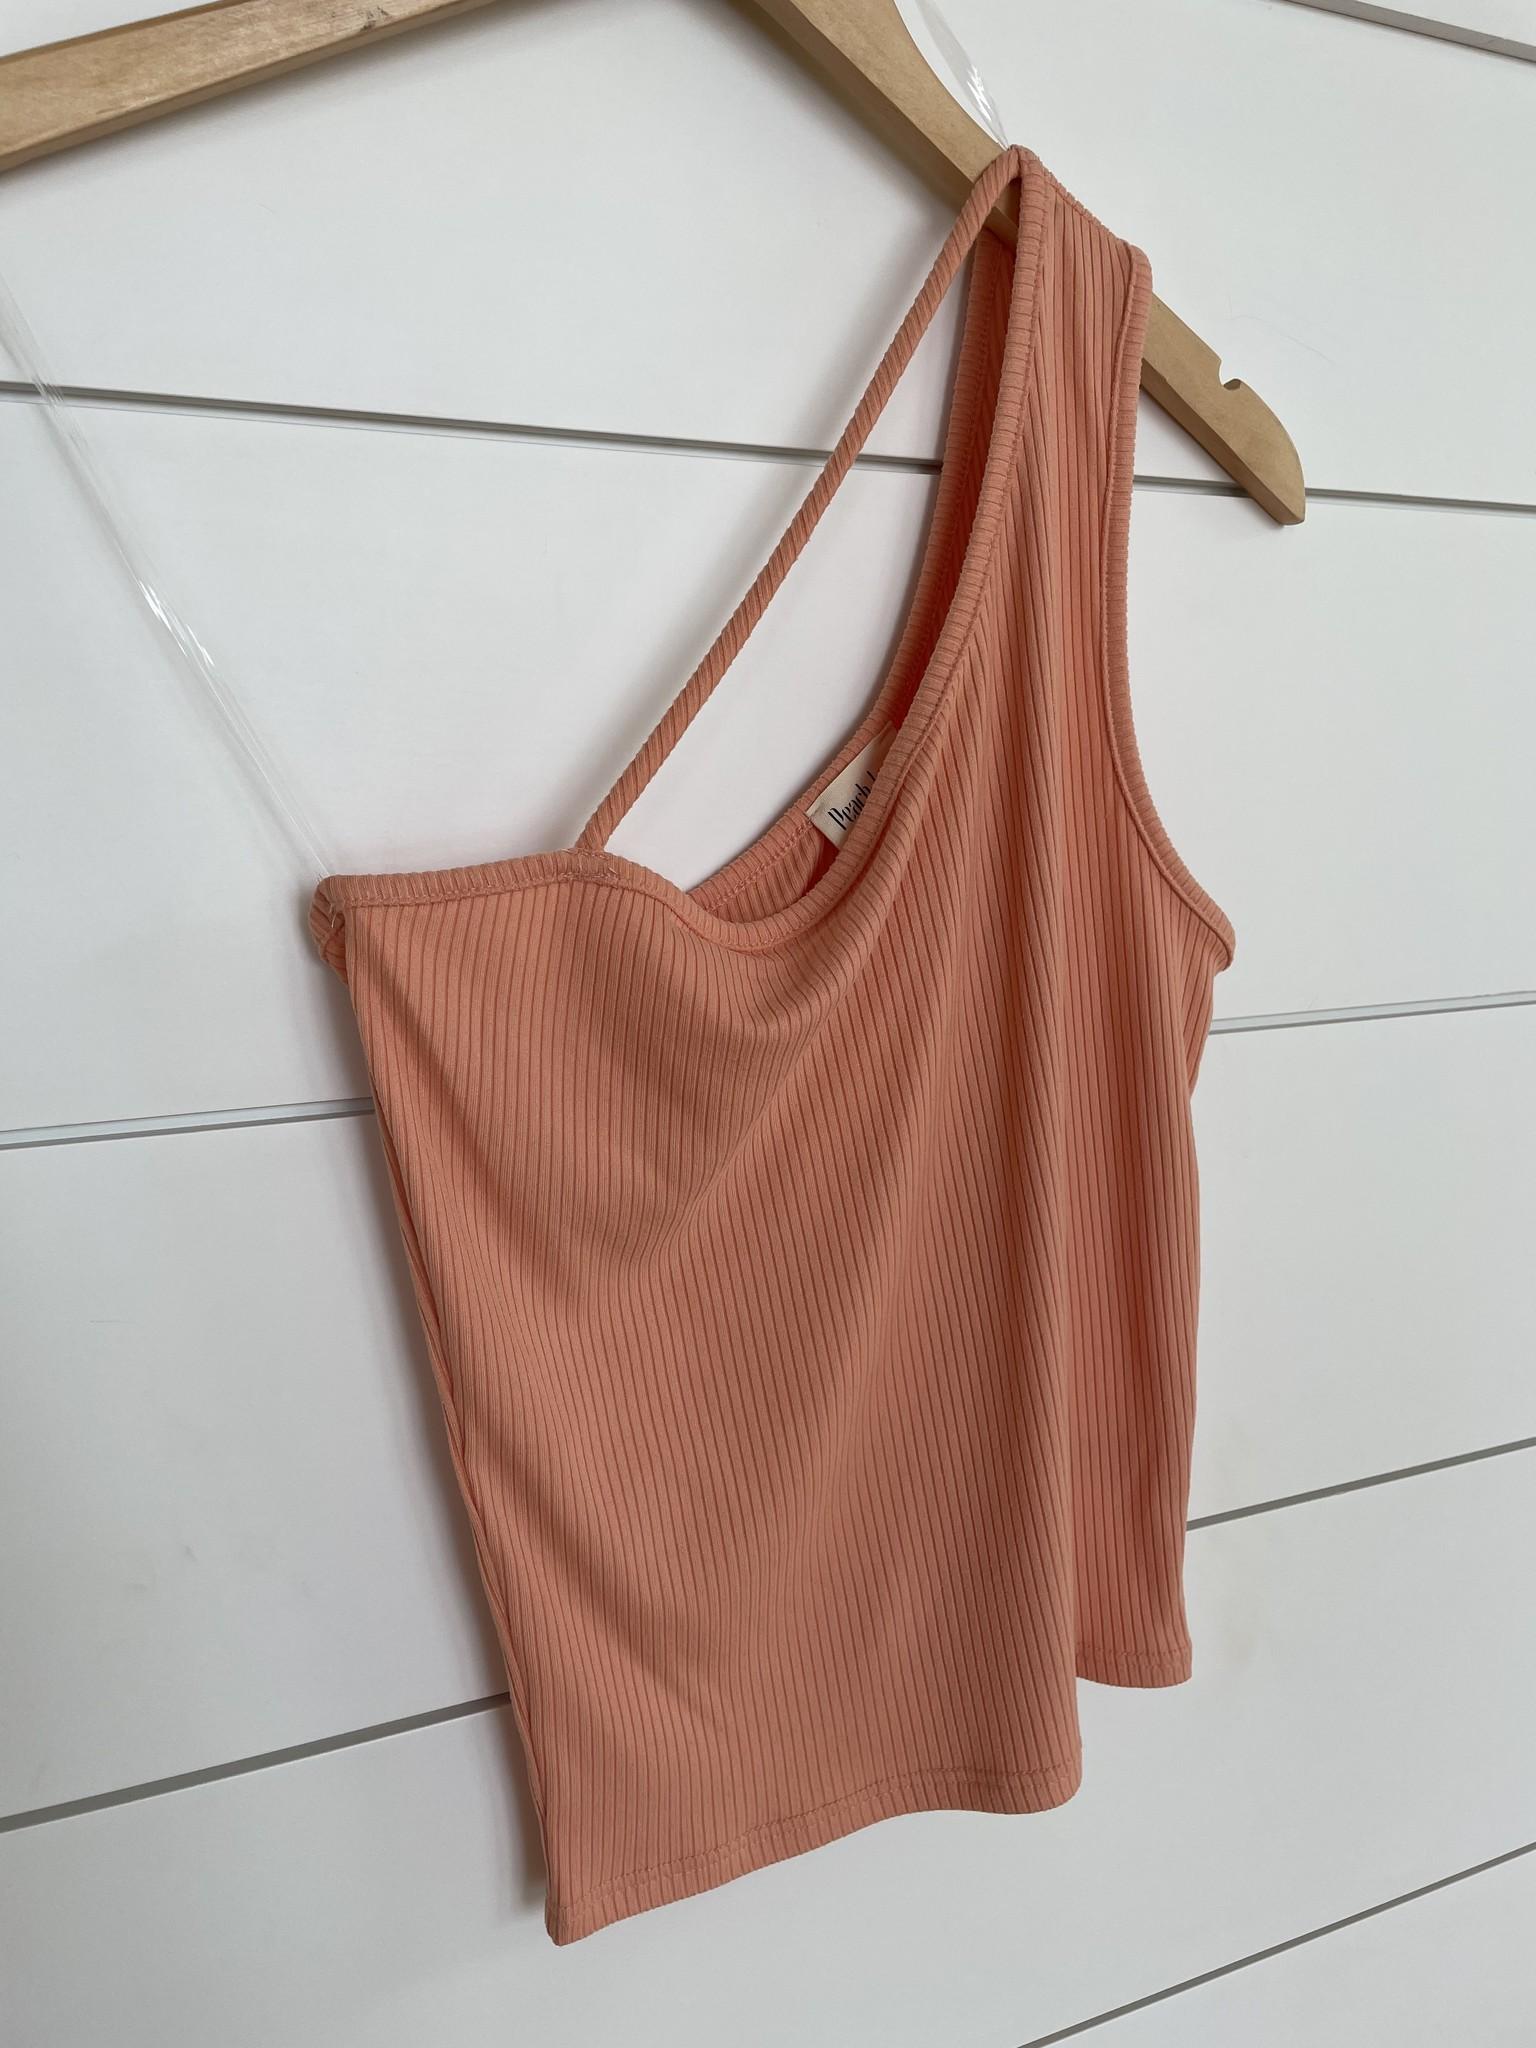 Dusty Orange One Shoulder Strap Detail Top